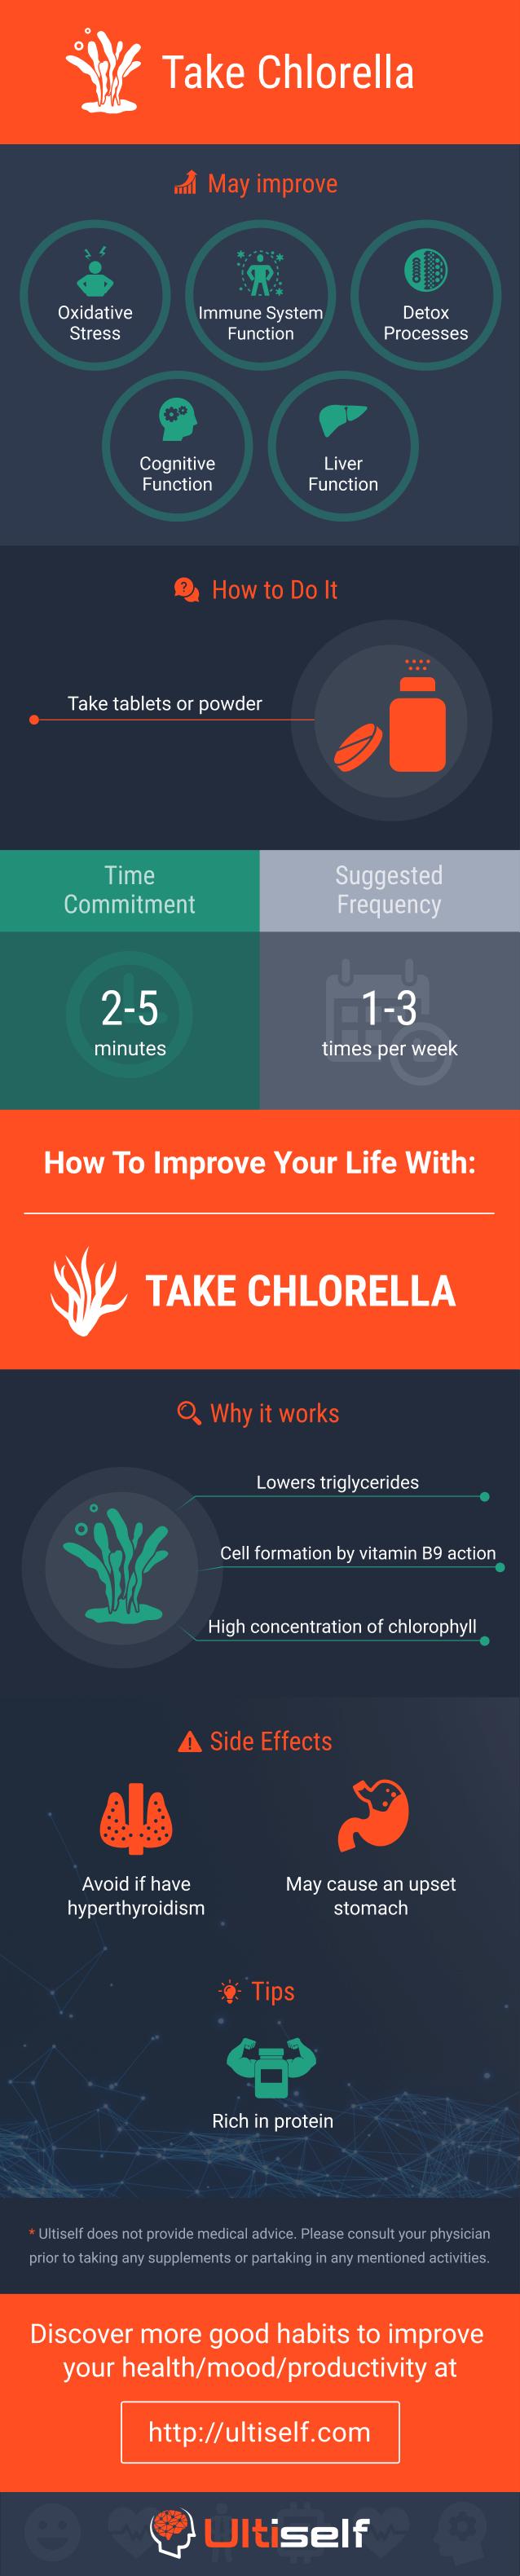 Take Сhlorella infographic